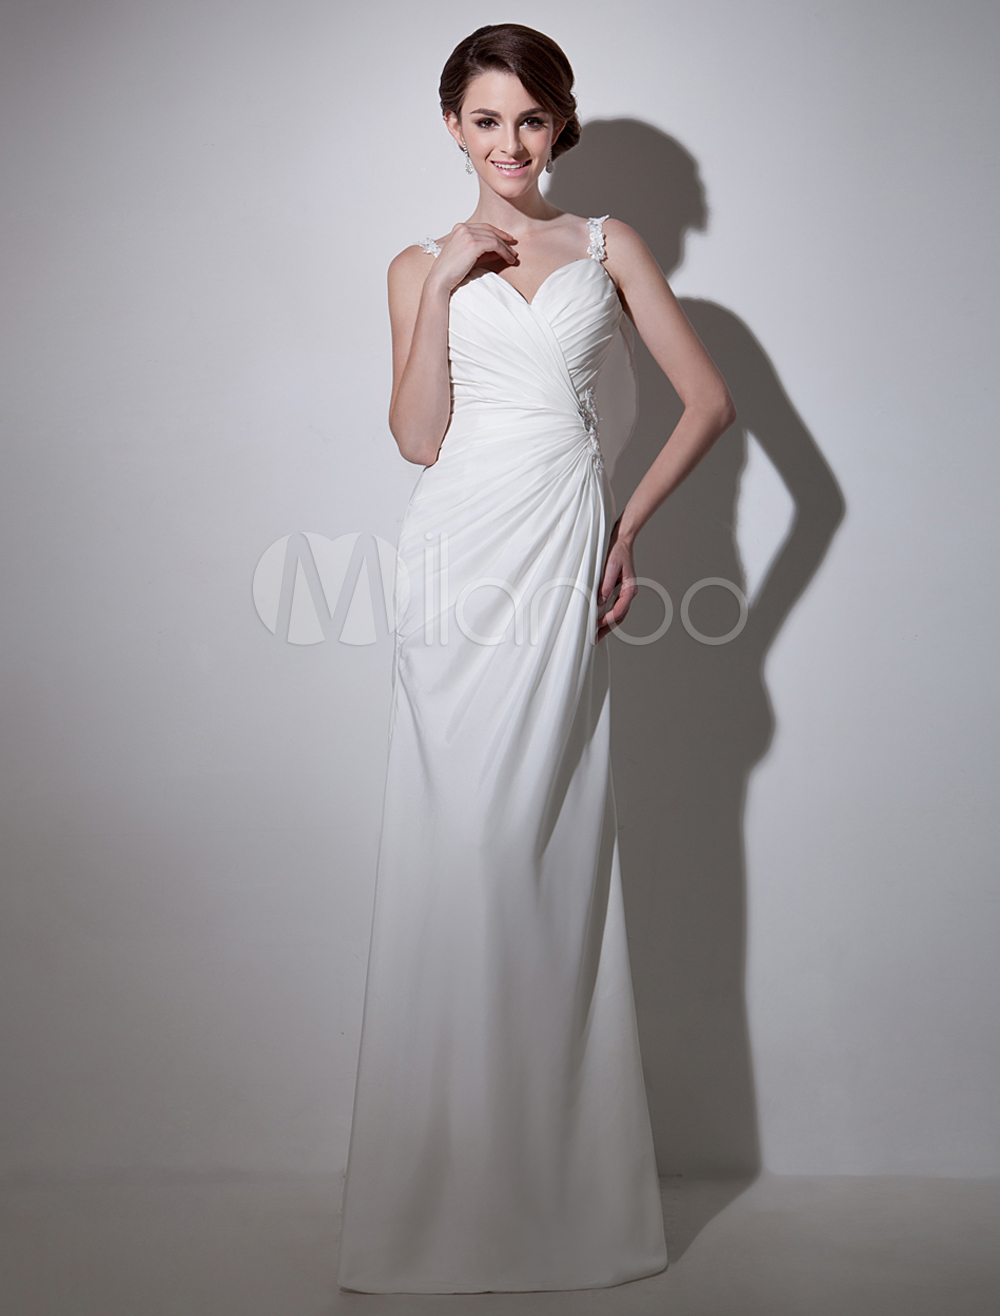 Milanoo ltd wedding dresses white sheath square neck